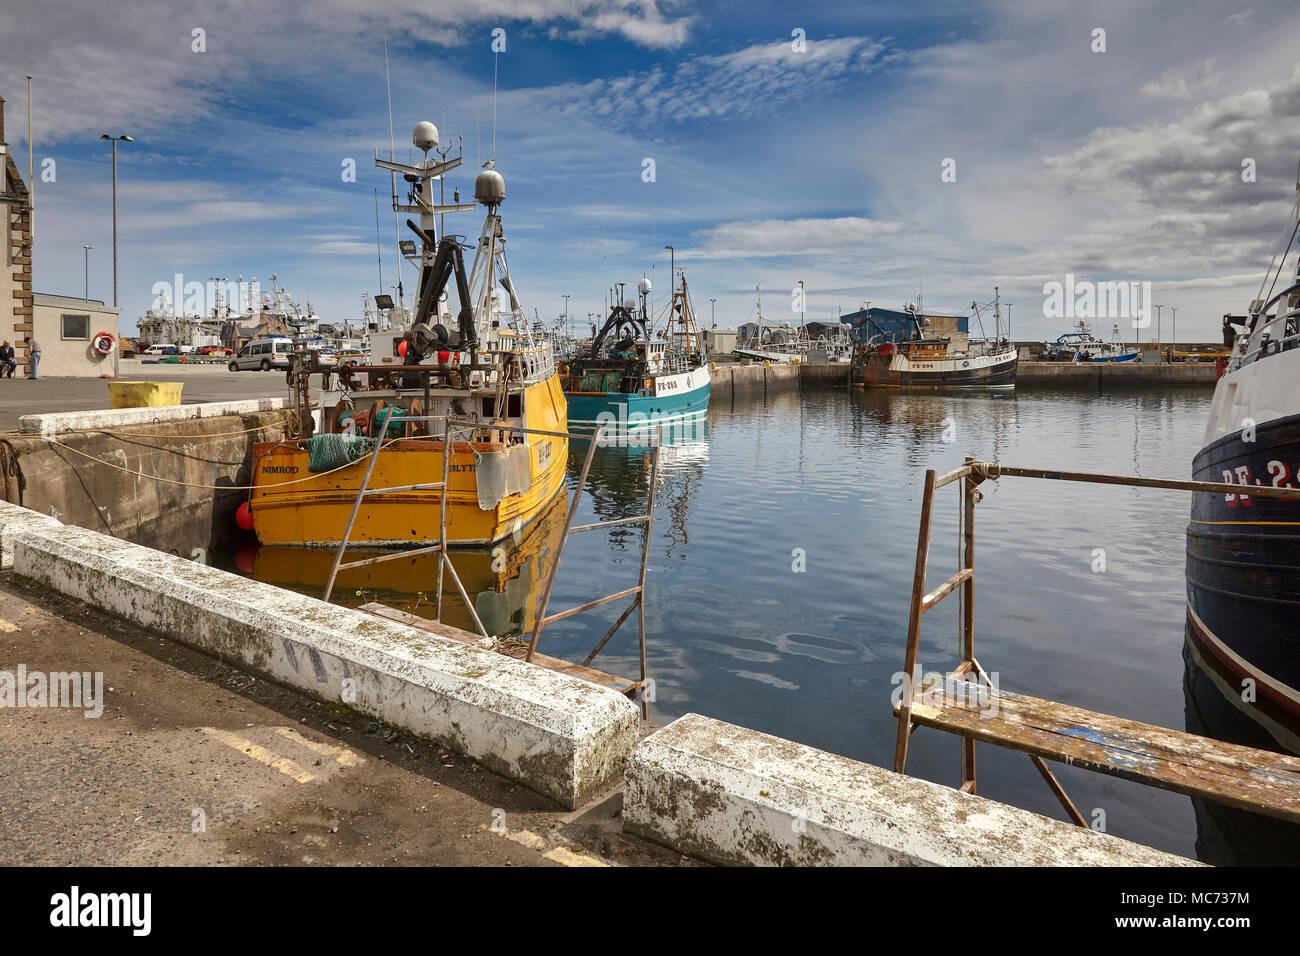 Near shore fishing vessels, Nimrod BH227, EL-SHADDAI FR 285 and Davanlin FR890 moored at Fraserburgh Harbour - Stock Image